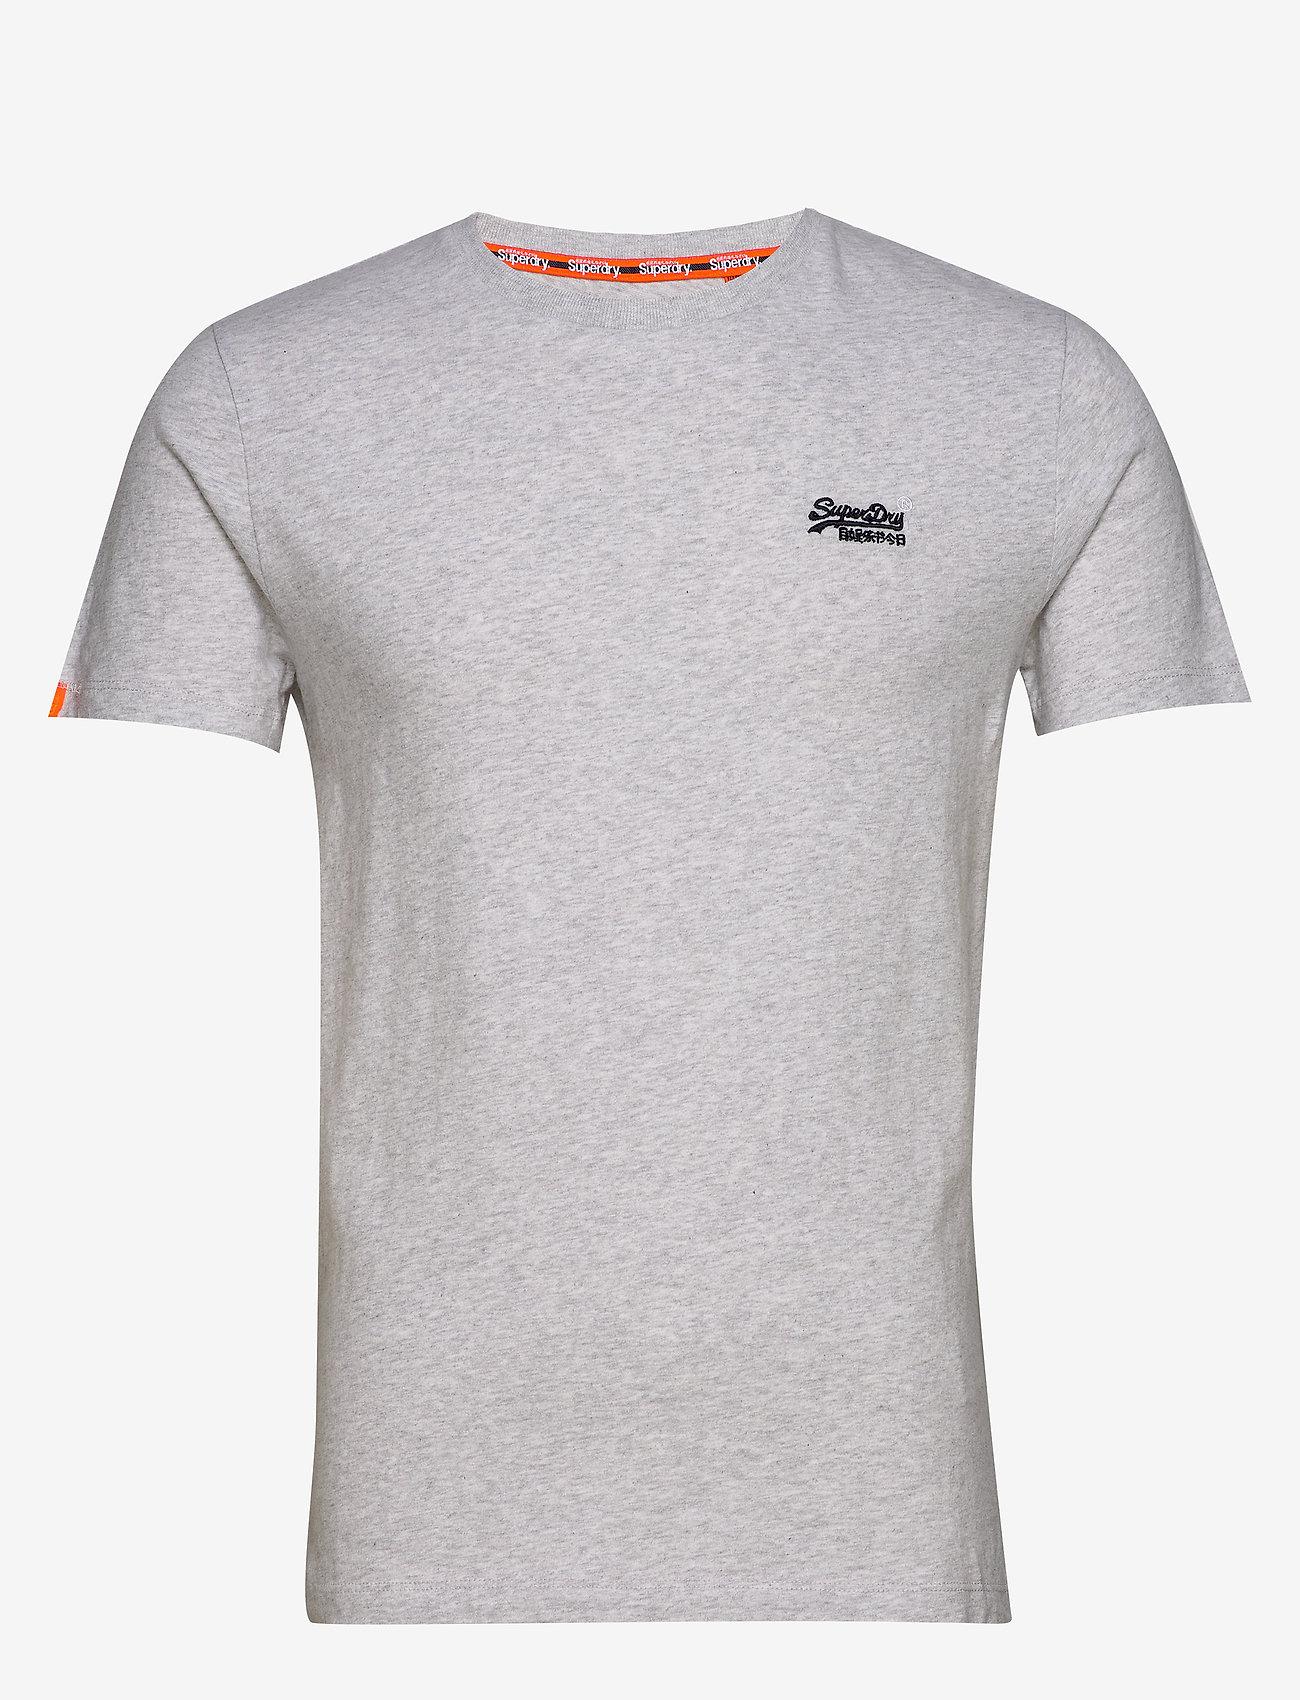 Superdry OL VINTAGE EMB CREW - T-shirts DESERT HINT TEAL MARL BK1OBWej